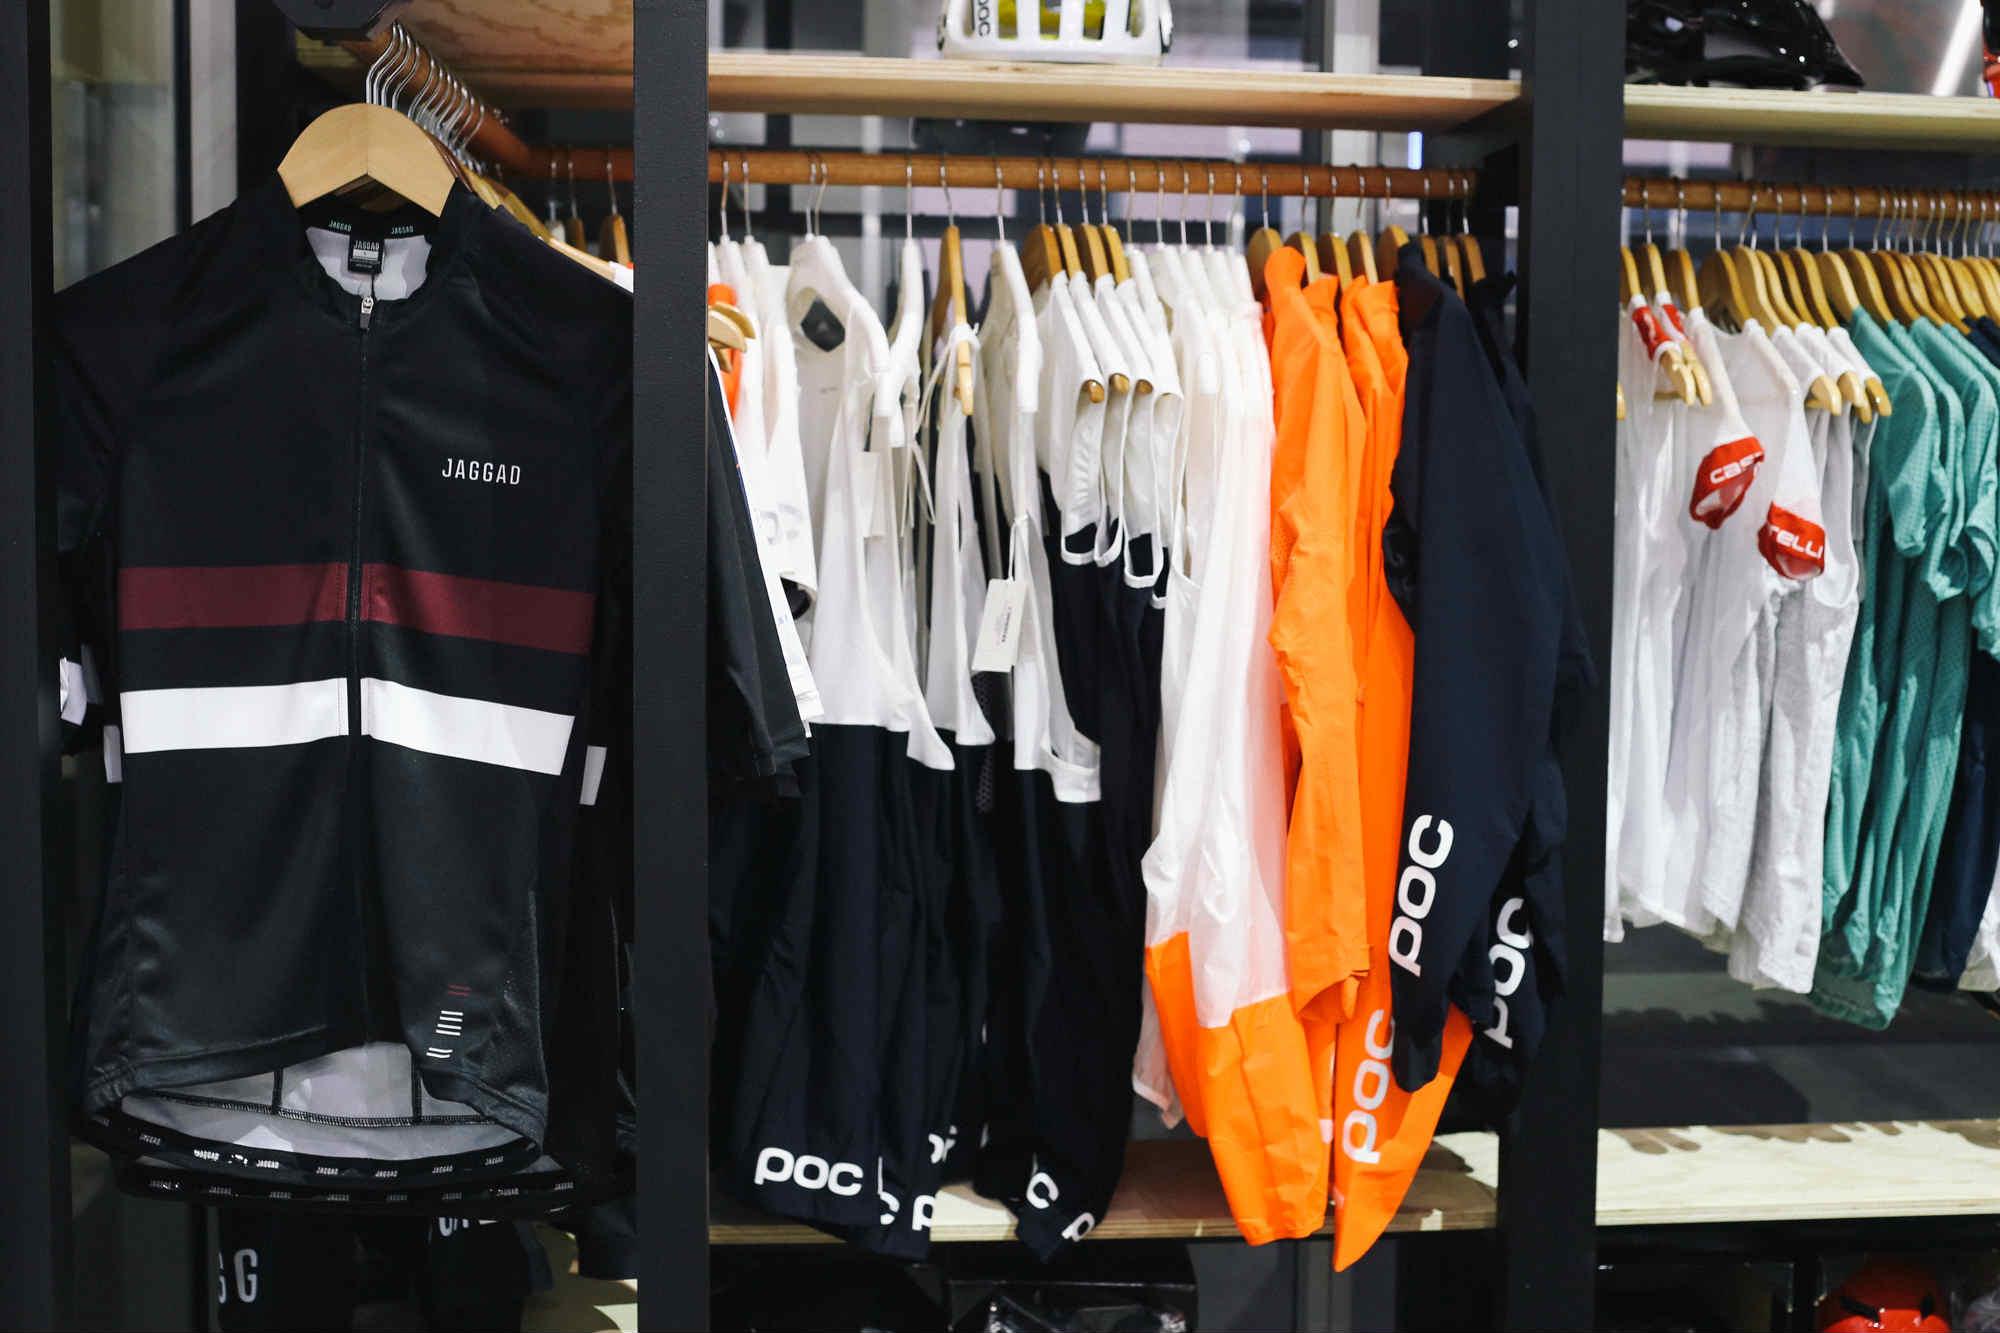 Aussie, Swedish, and Italian kit all on the same rack. Glorious.